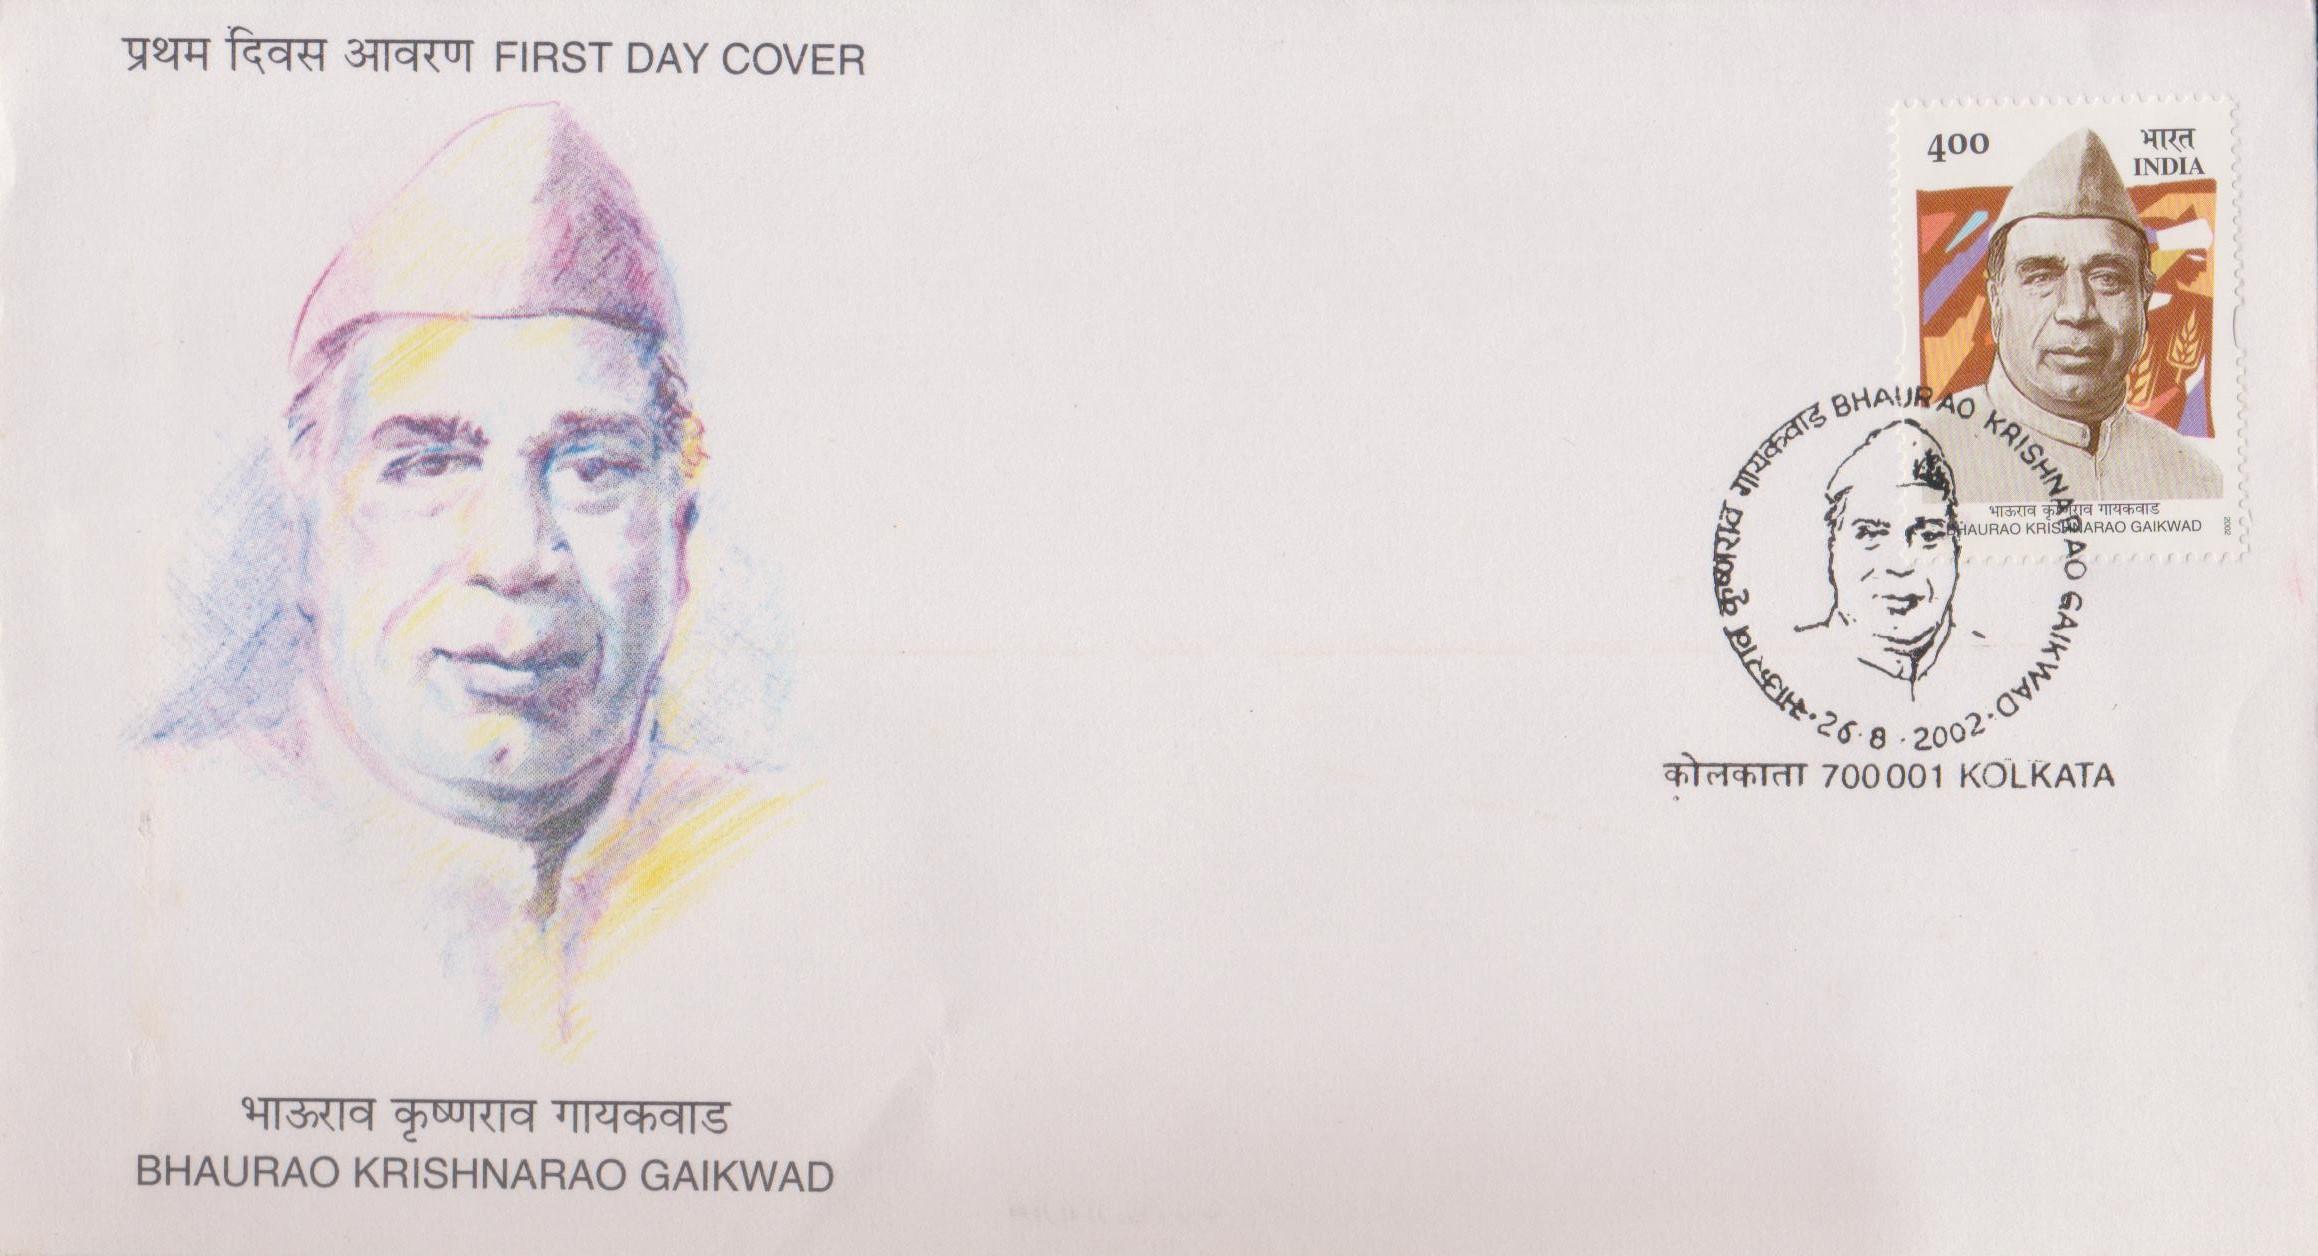 Bhaurao Krishnaji Gaikwad : Republican Party of India (RPI)